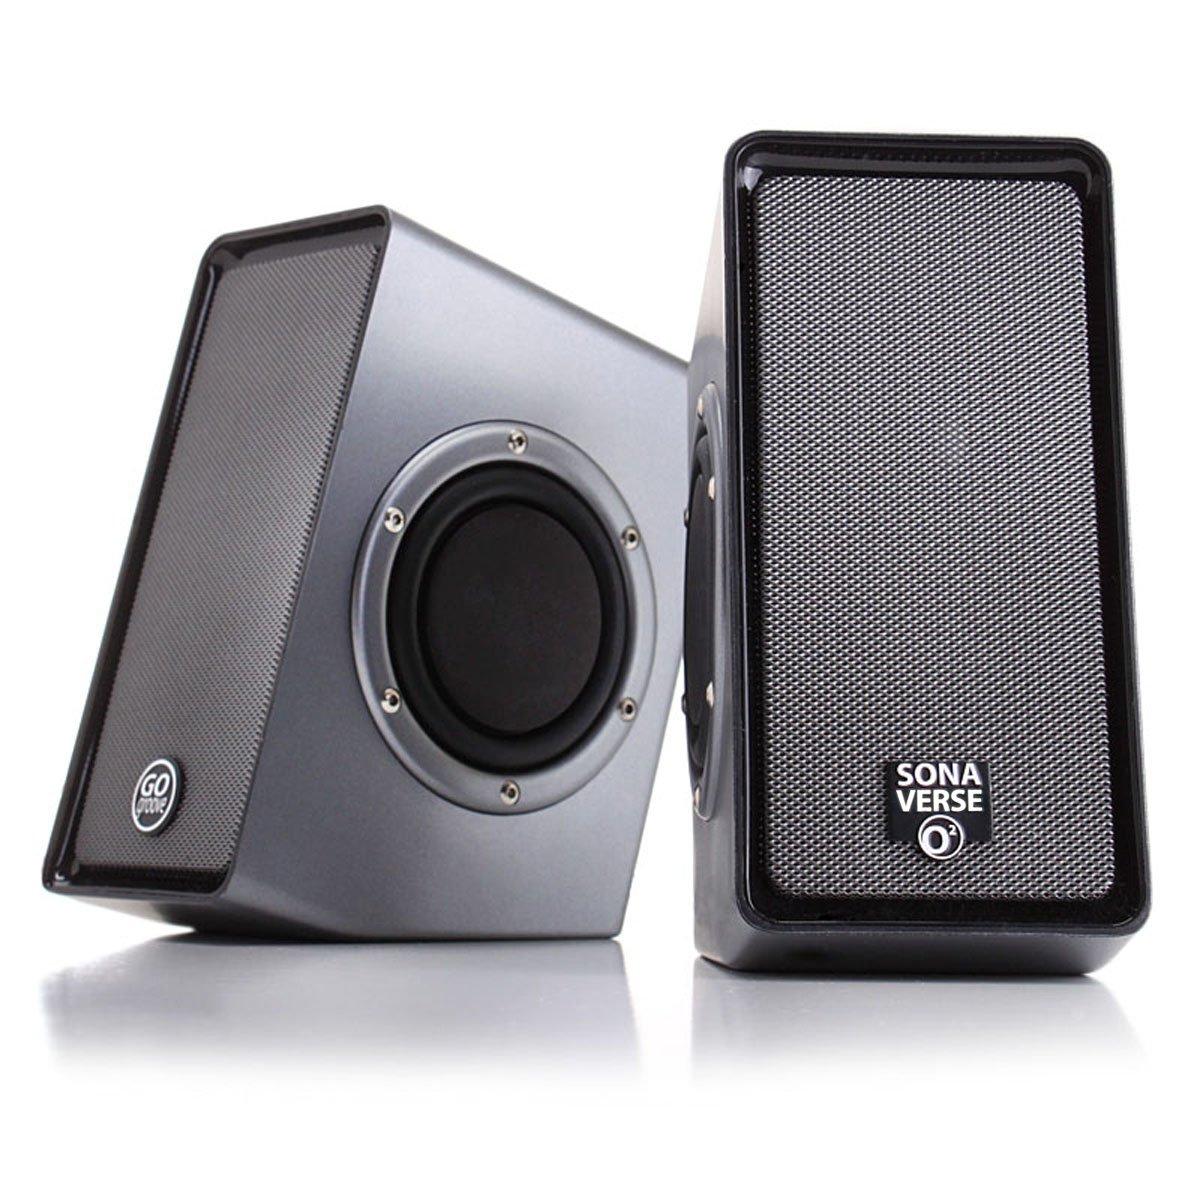 GOgroove Computer Lautsprecher Set SonaWAVE O2: 2.0 USB Stereo Lautsprecher mit passiven Woofern, Schwarz Accessory Power FBA_GG-SONAWAVE-O2